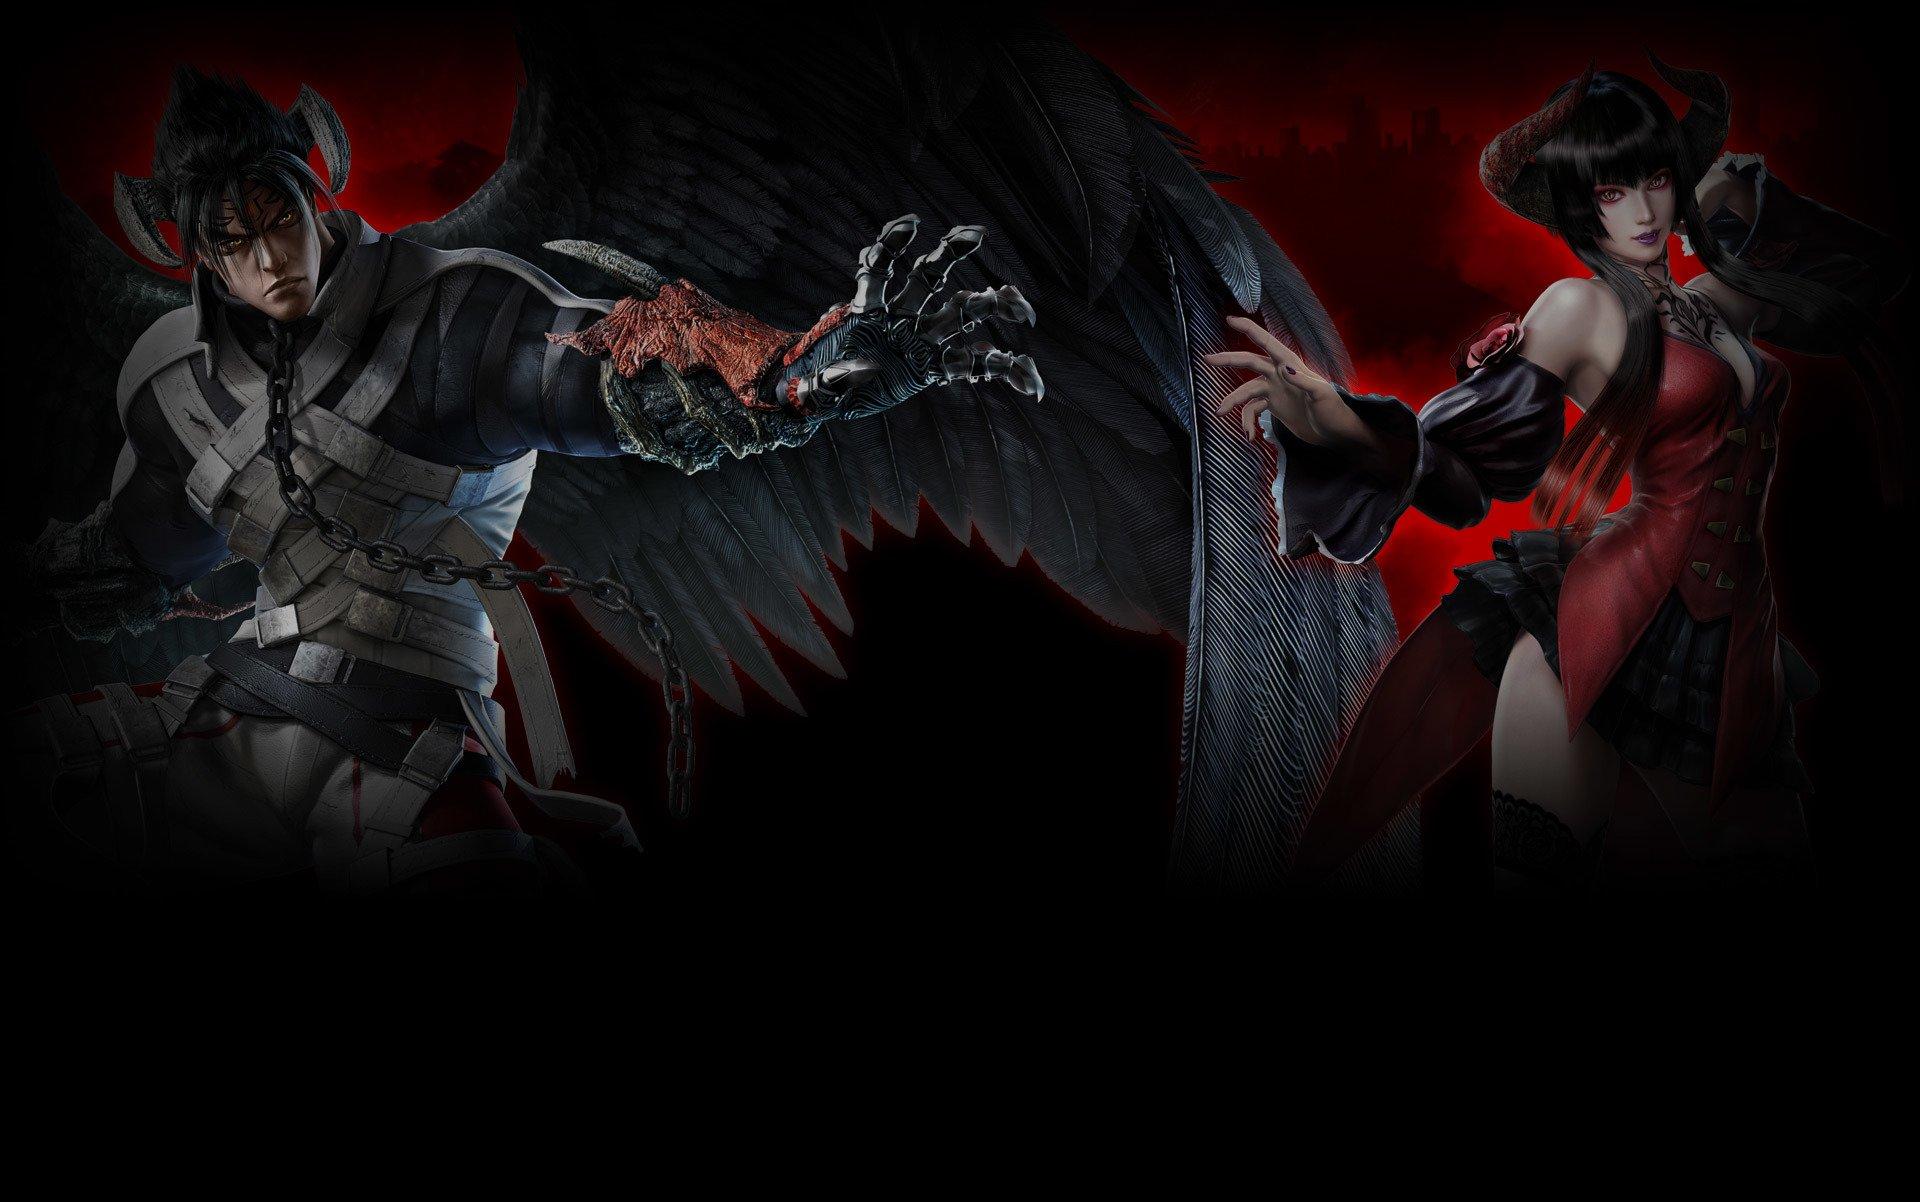 3 Eliza Tekken Hd Wallpapers Background Images Wallpaper Abyss